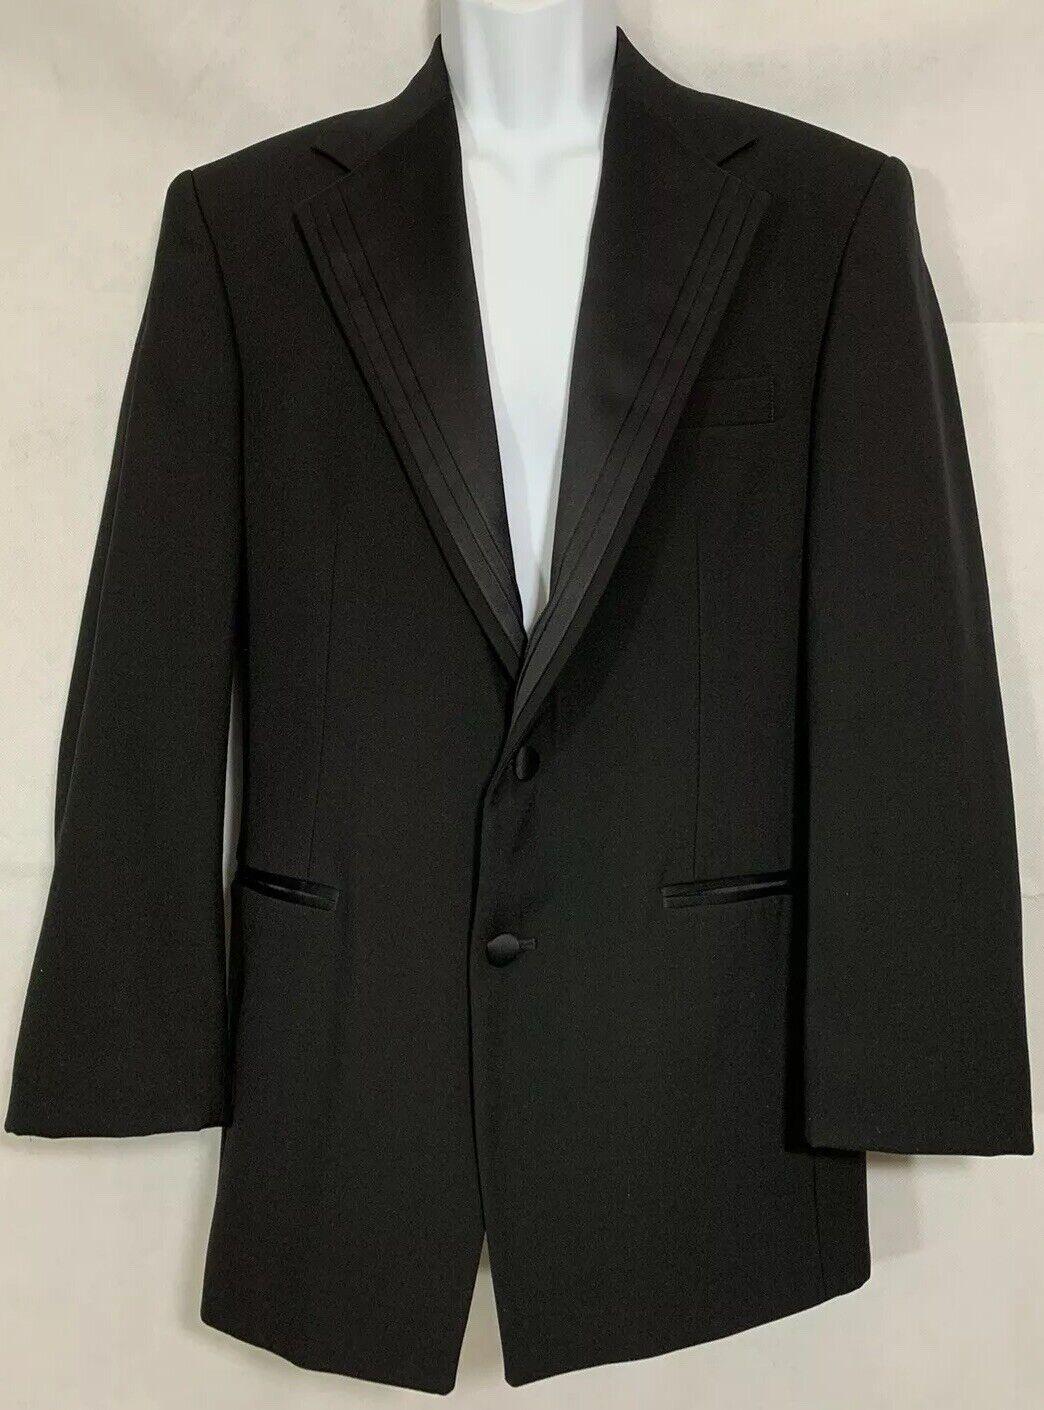 After Six Nuvo II 2 Button Black Tuxedo Jacket Sz 41S Layered Satin Notch Lapel